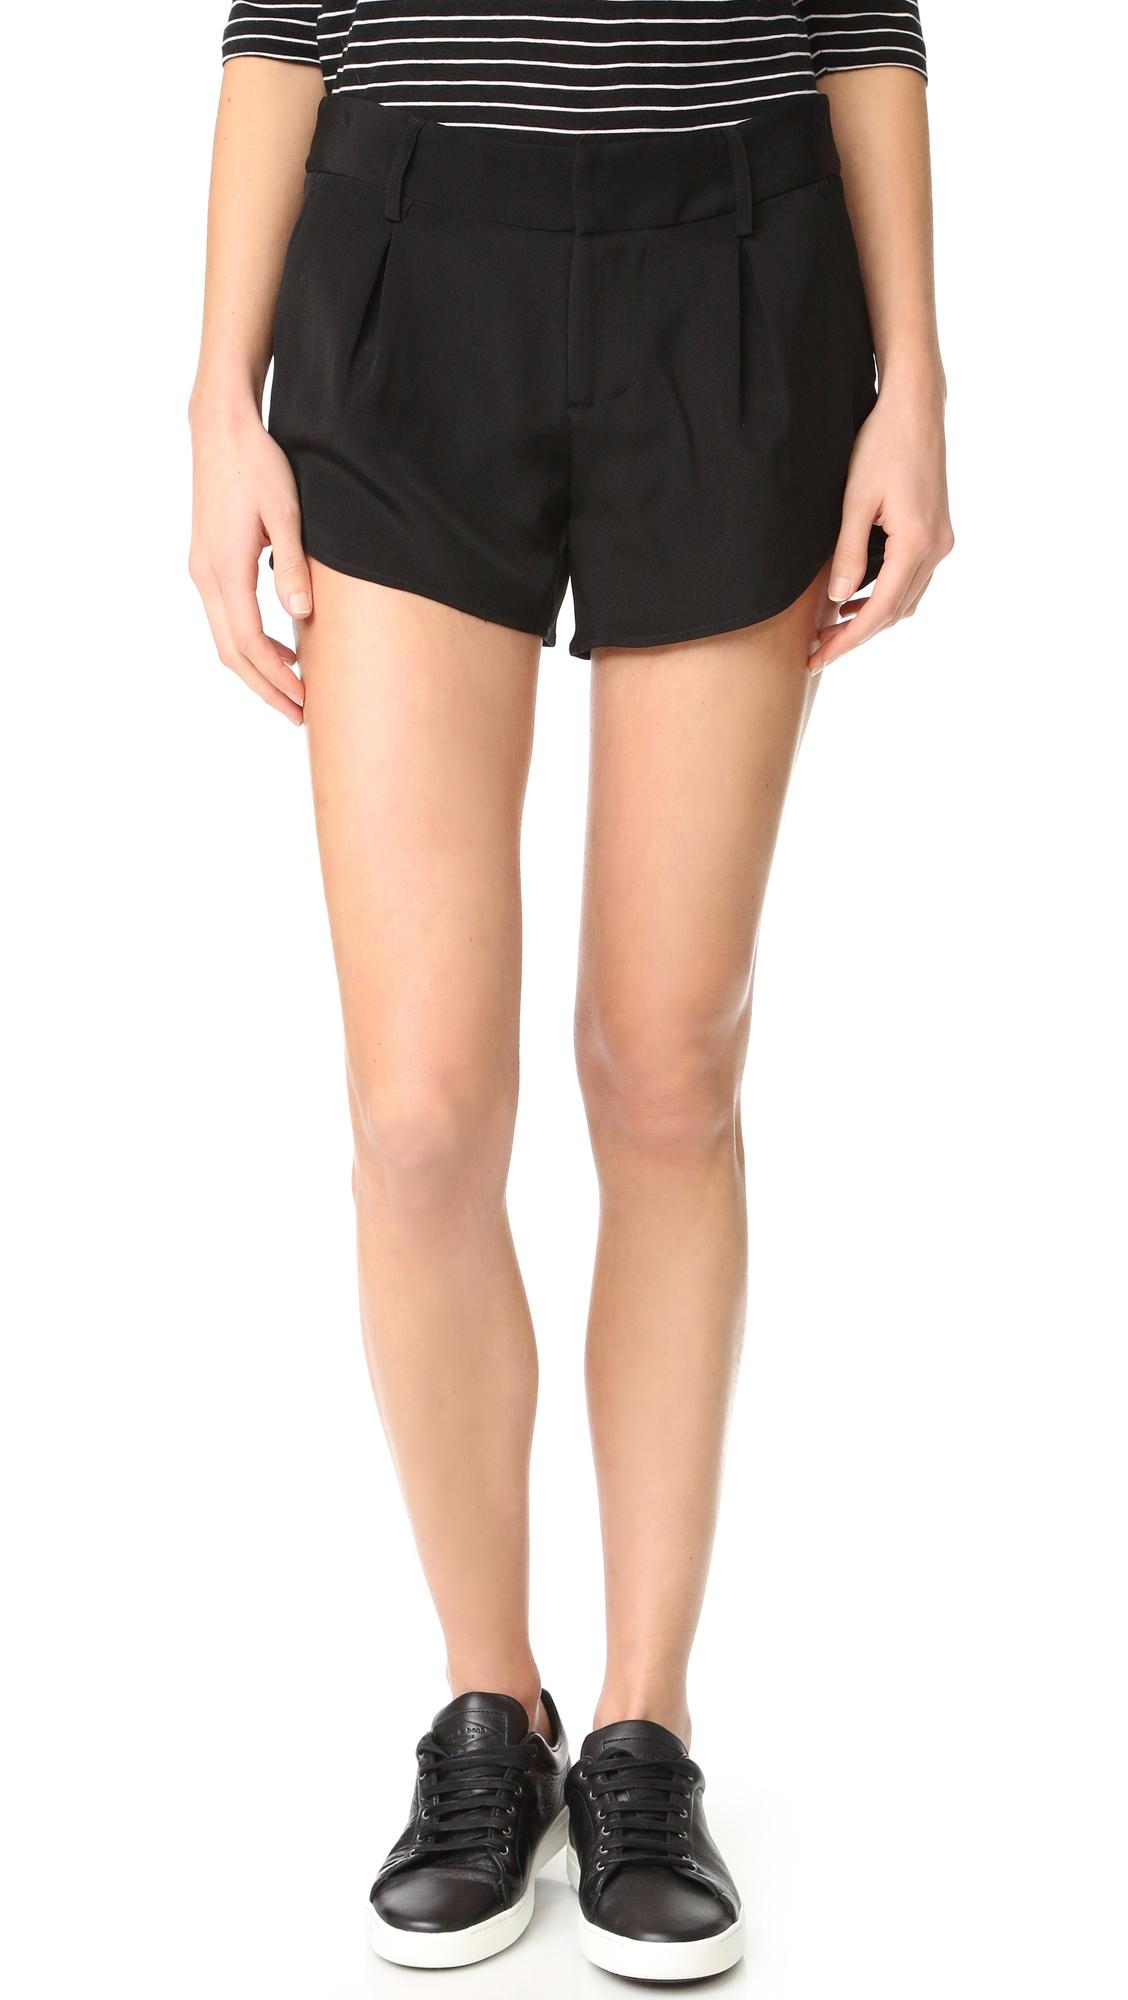 Alice + Olivia Butterfly Shorts - Black at Shopbop